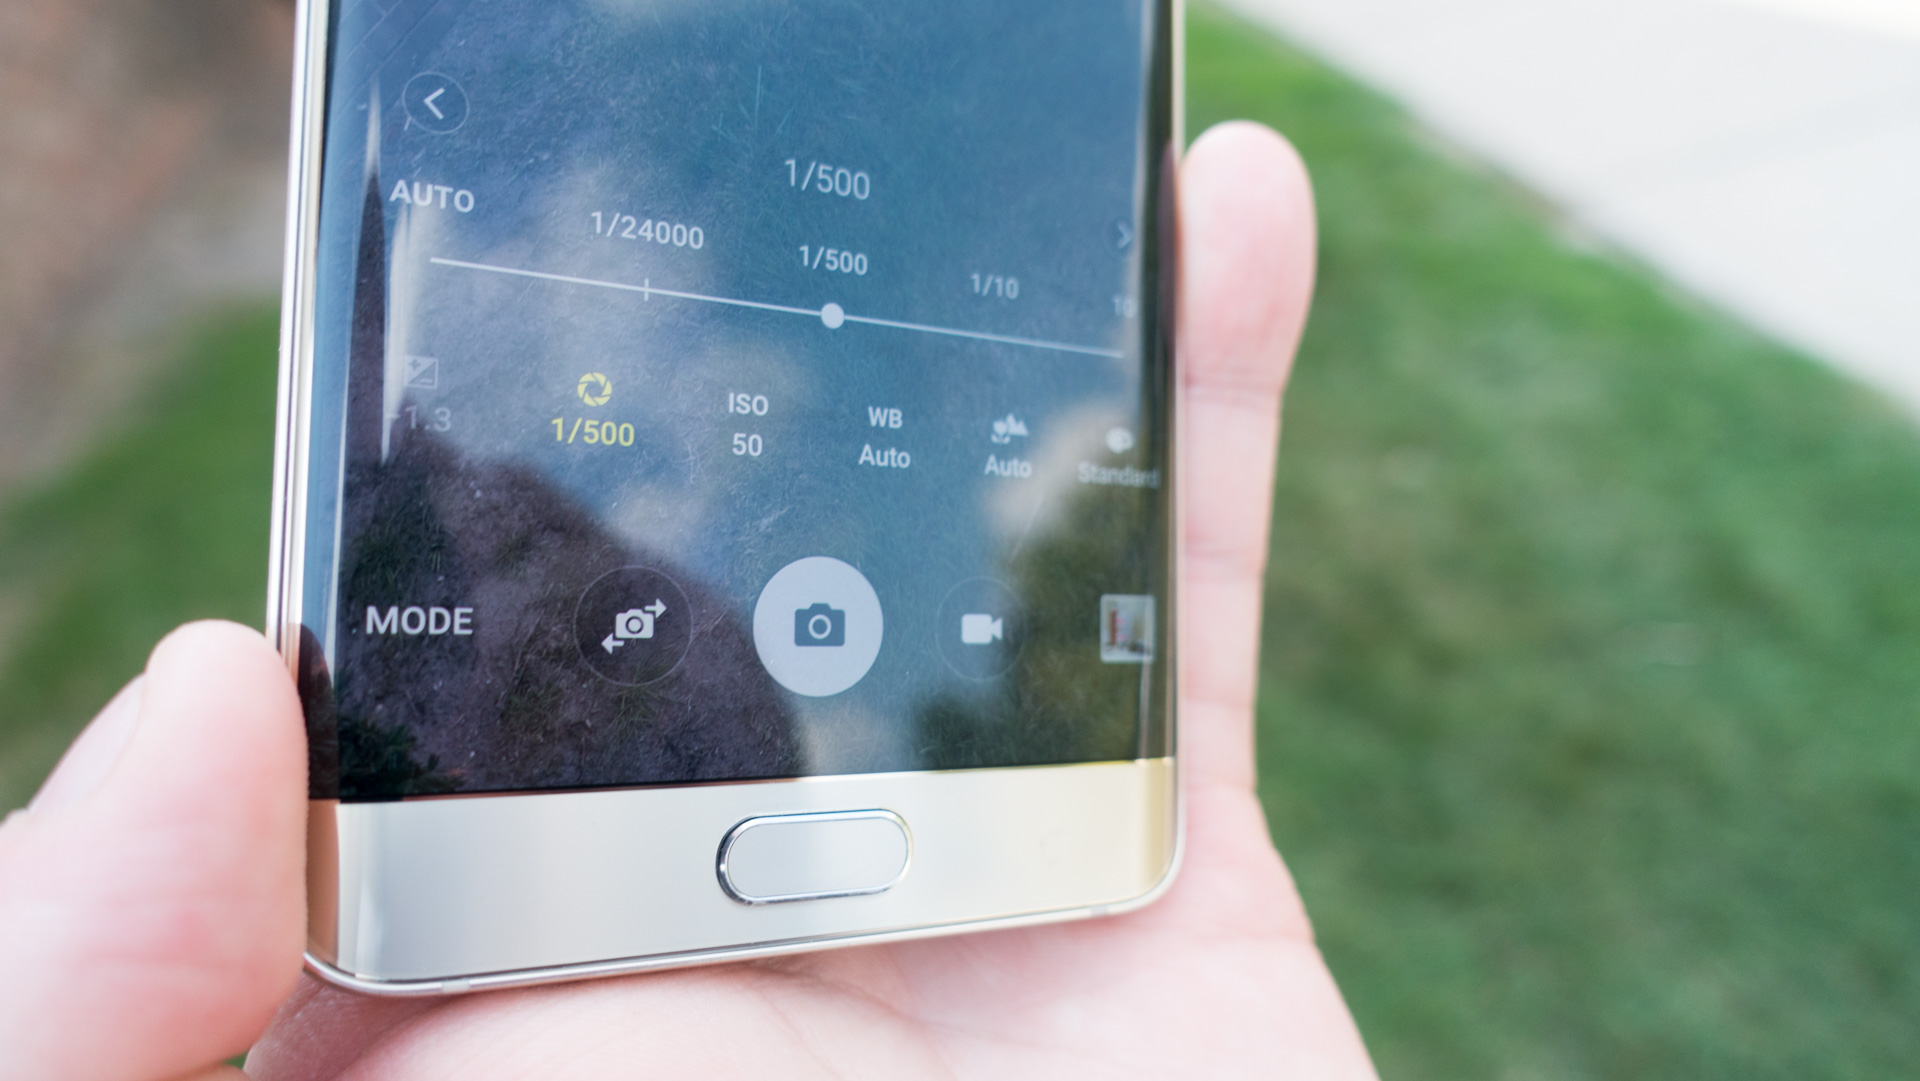 Samsung-Galaxy-S6-Edge-plus-Camera-Tips-Tricks-AH-3